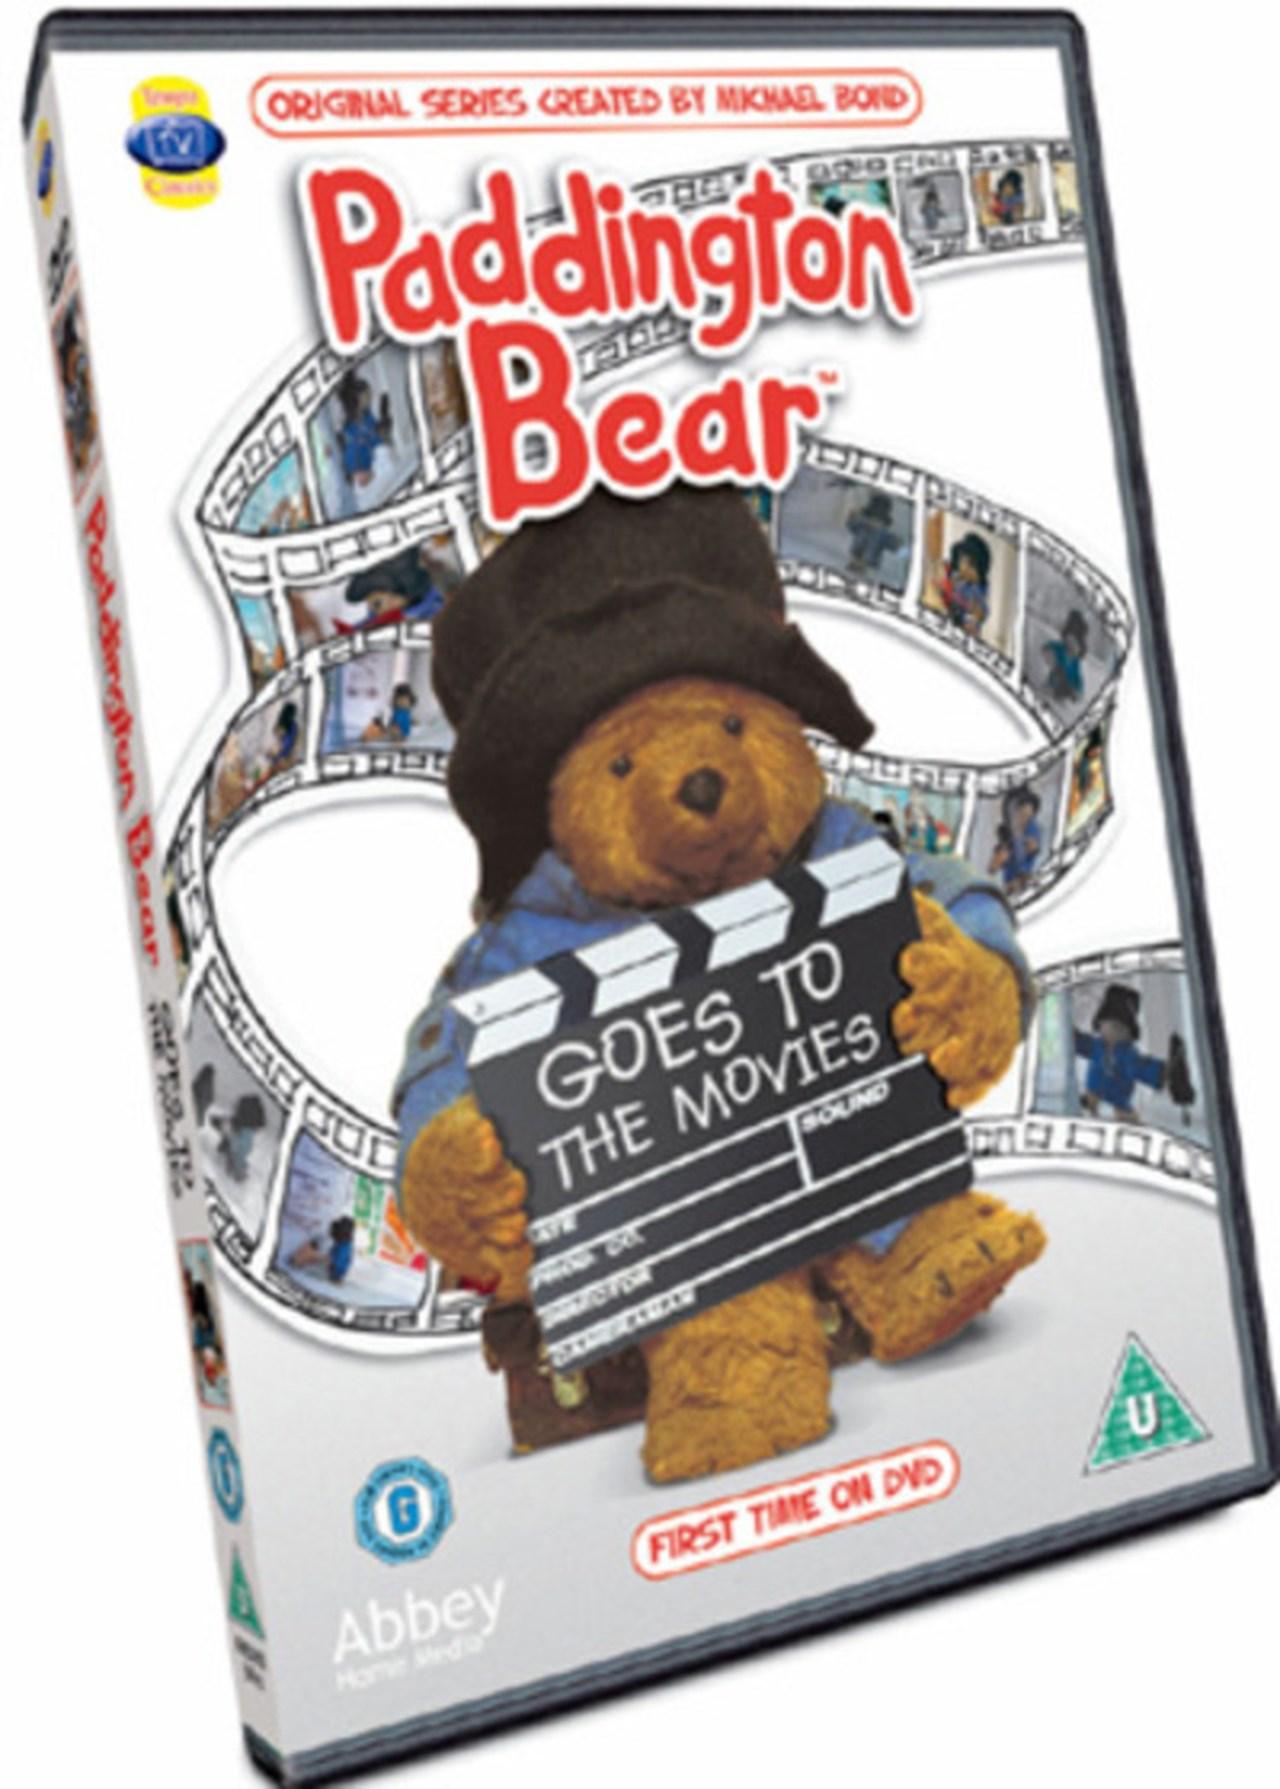 Paddington Bear: Paddington Goes to the Movies - 1